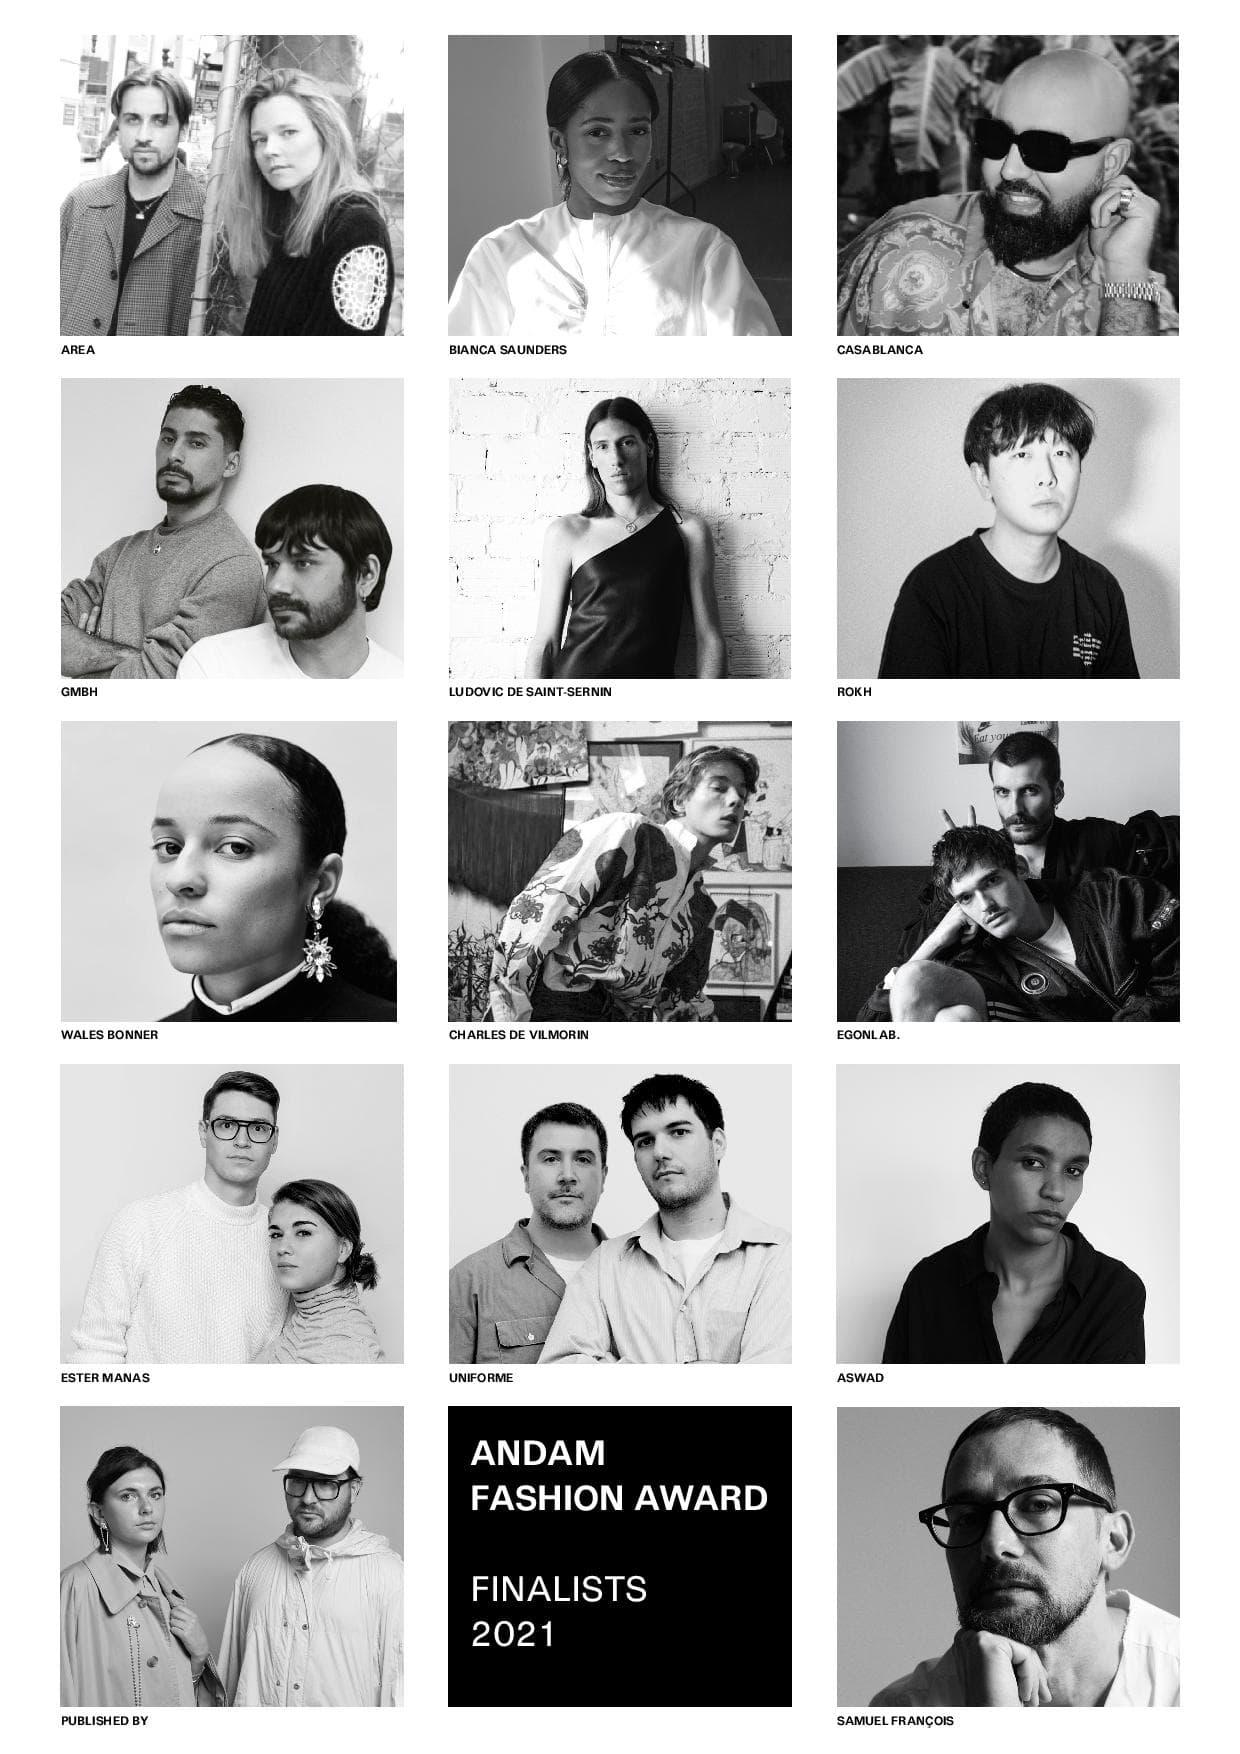 ANDAM Fashion Awards 2021 Names 14 Finalists